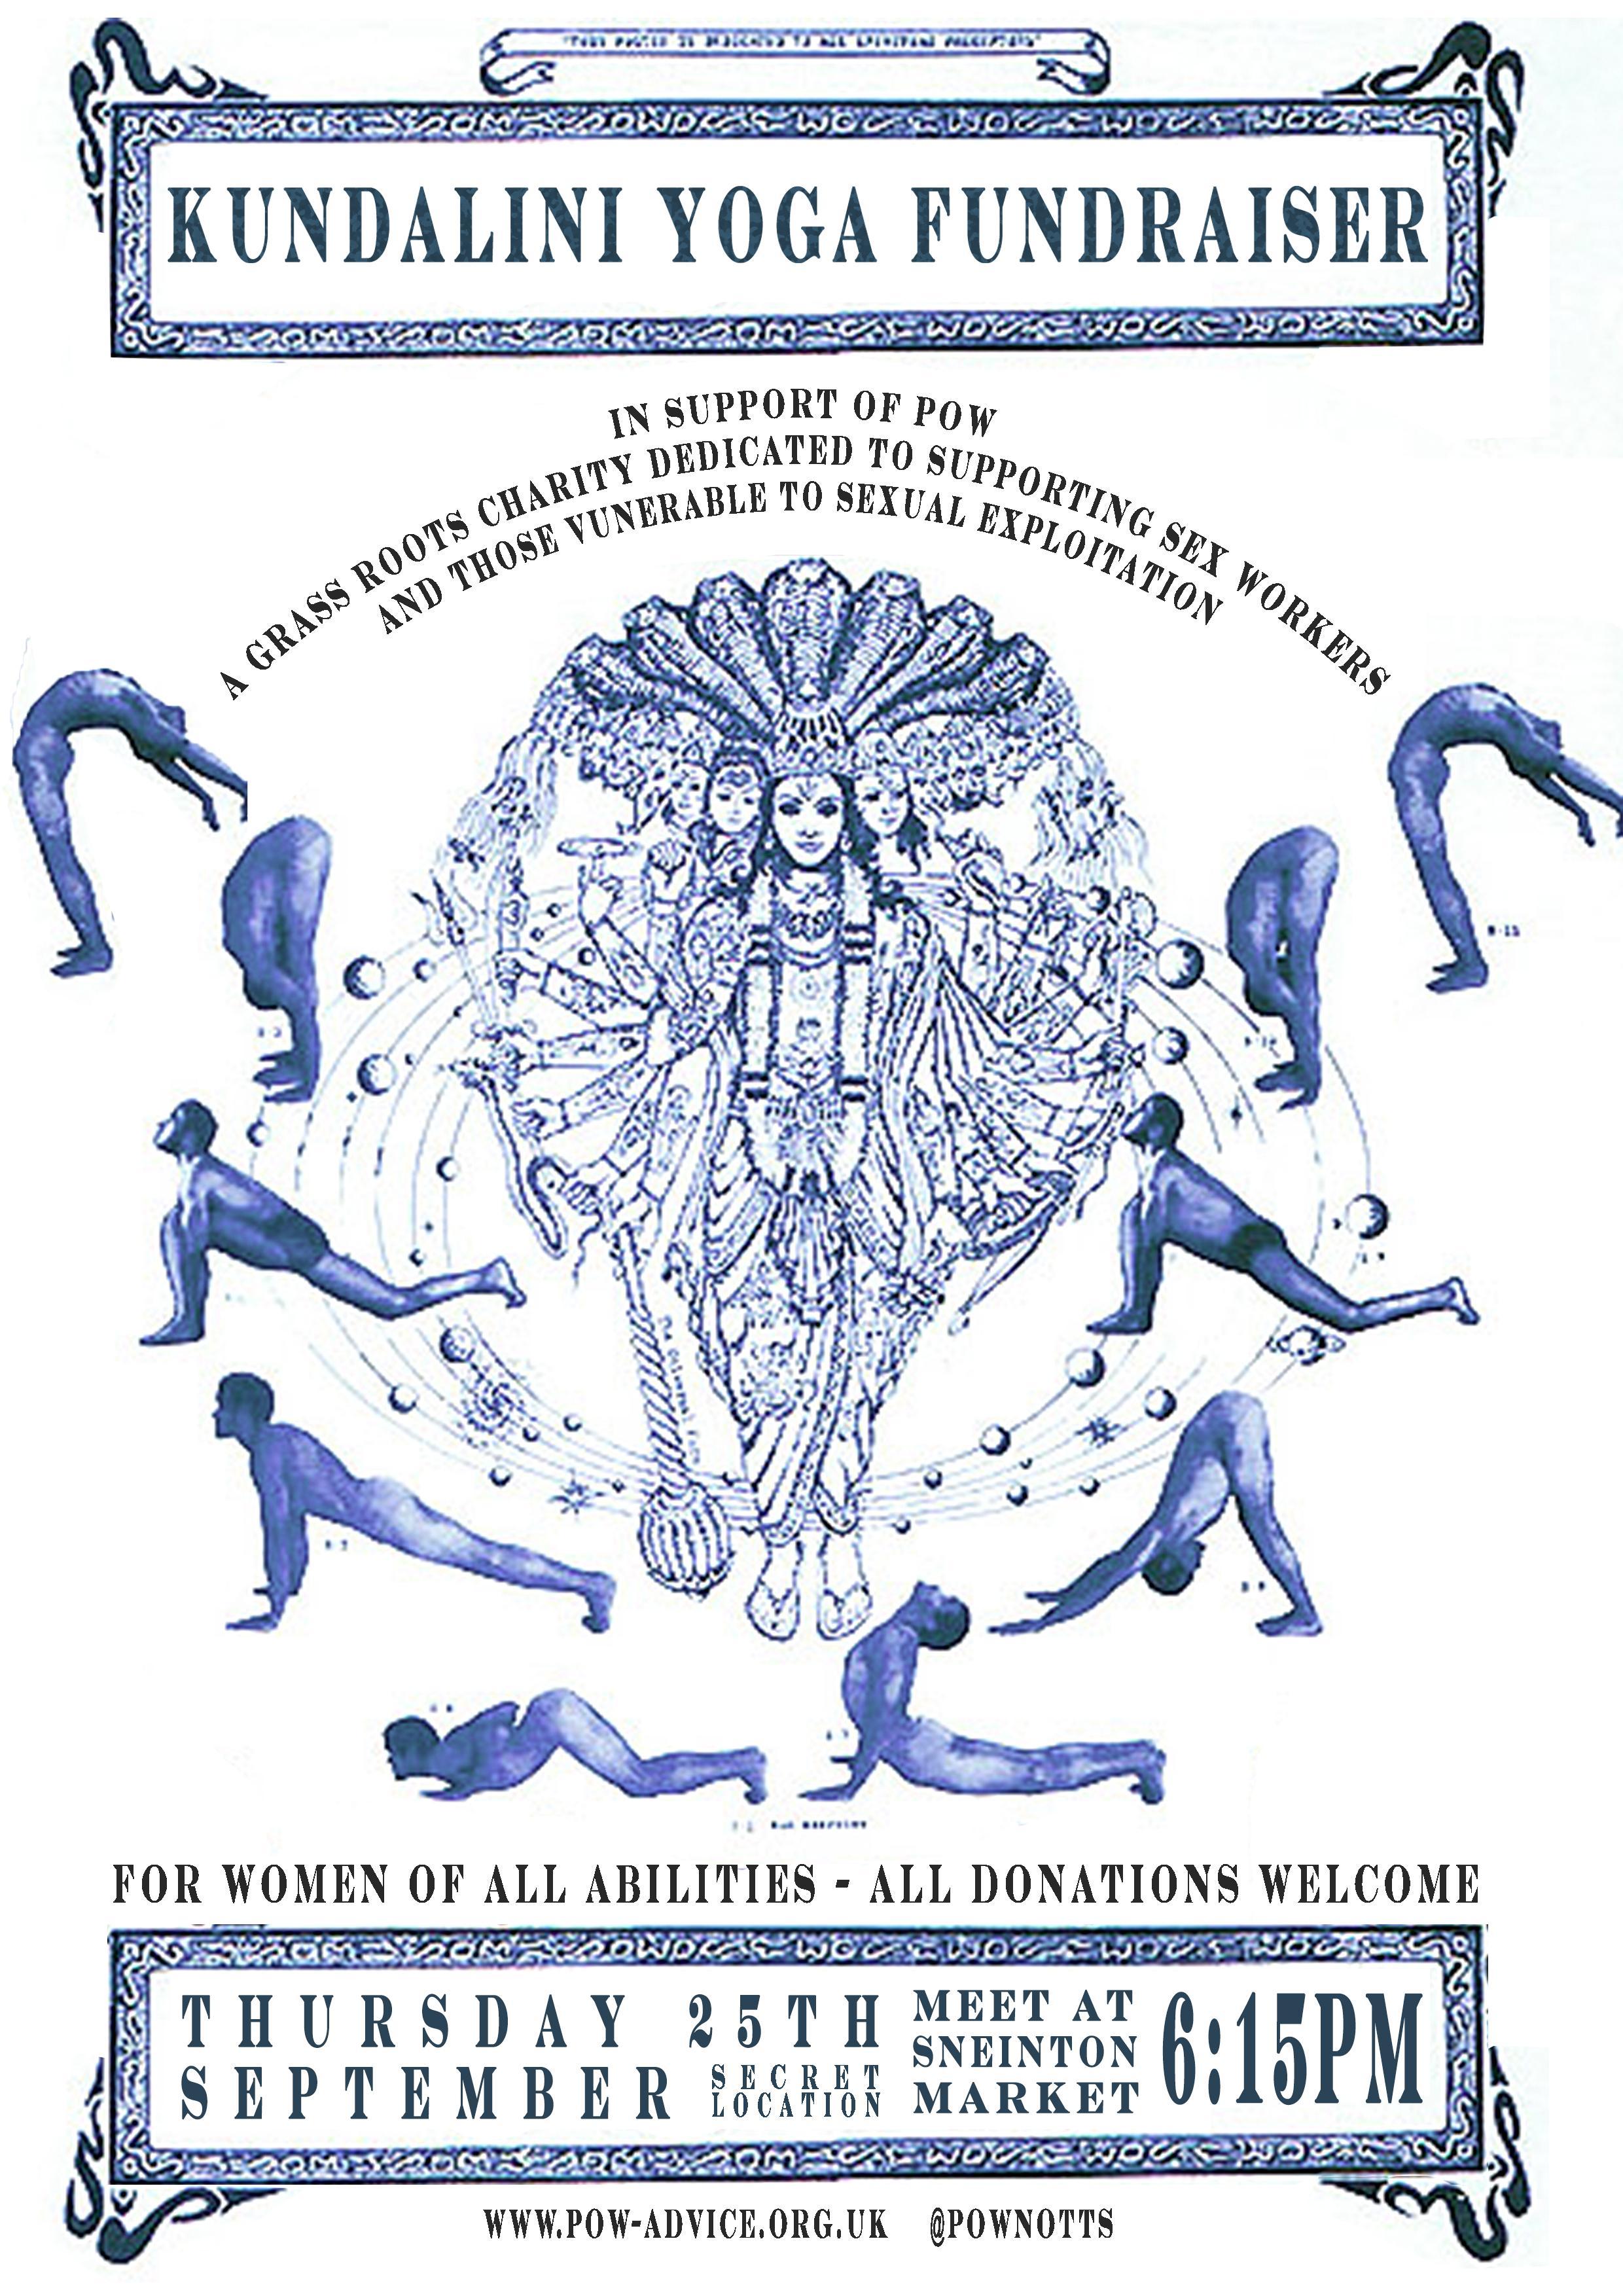 POW and Kundalini Calm Yoga Fundraiser